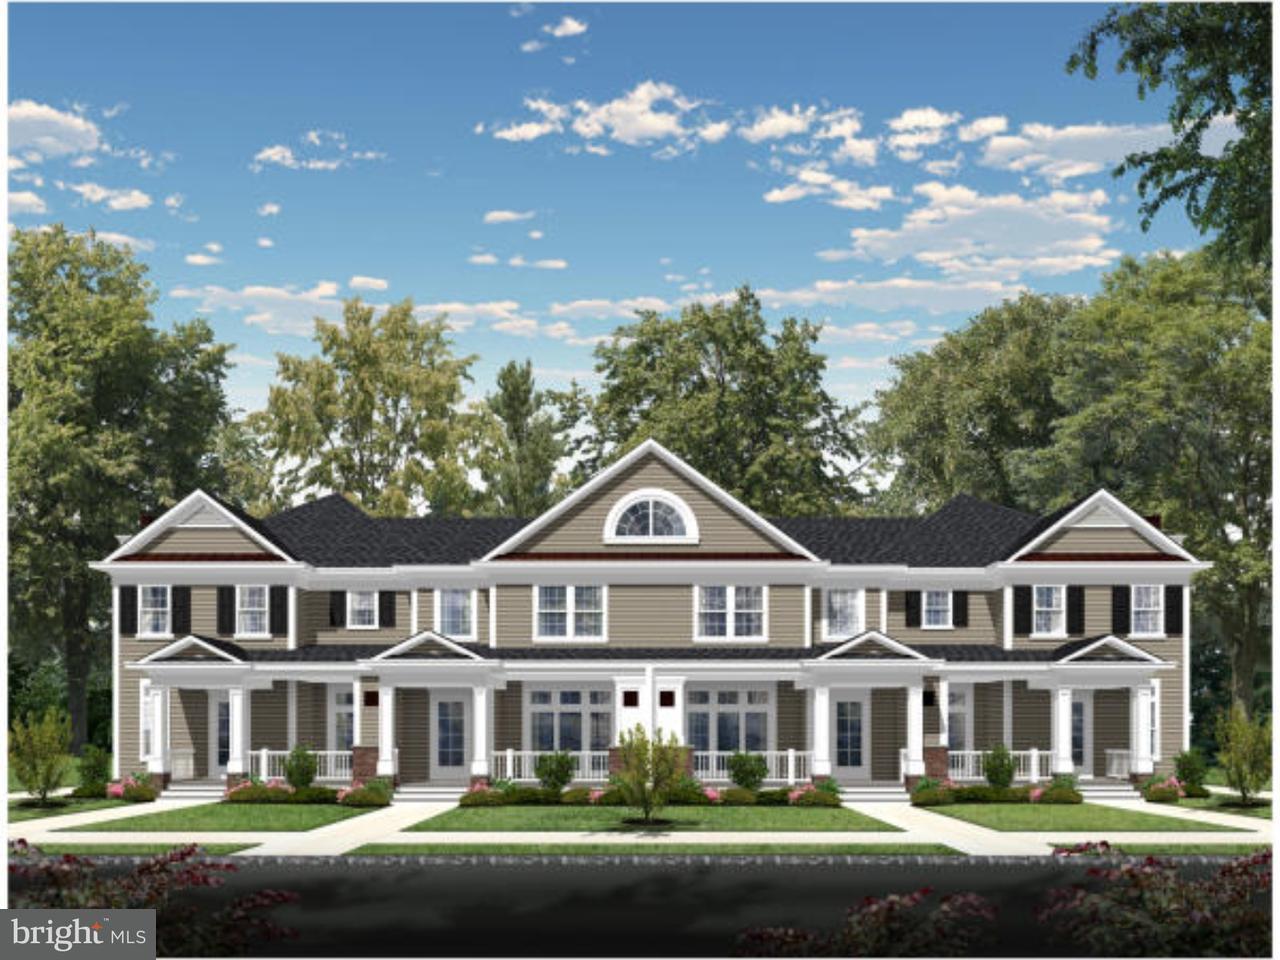 Townhouse for Sale at 29 HAMILTON Drive Cranbury, New Jersey 08512 United StatesMunicipality: Cranbury Township